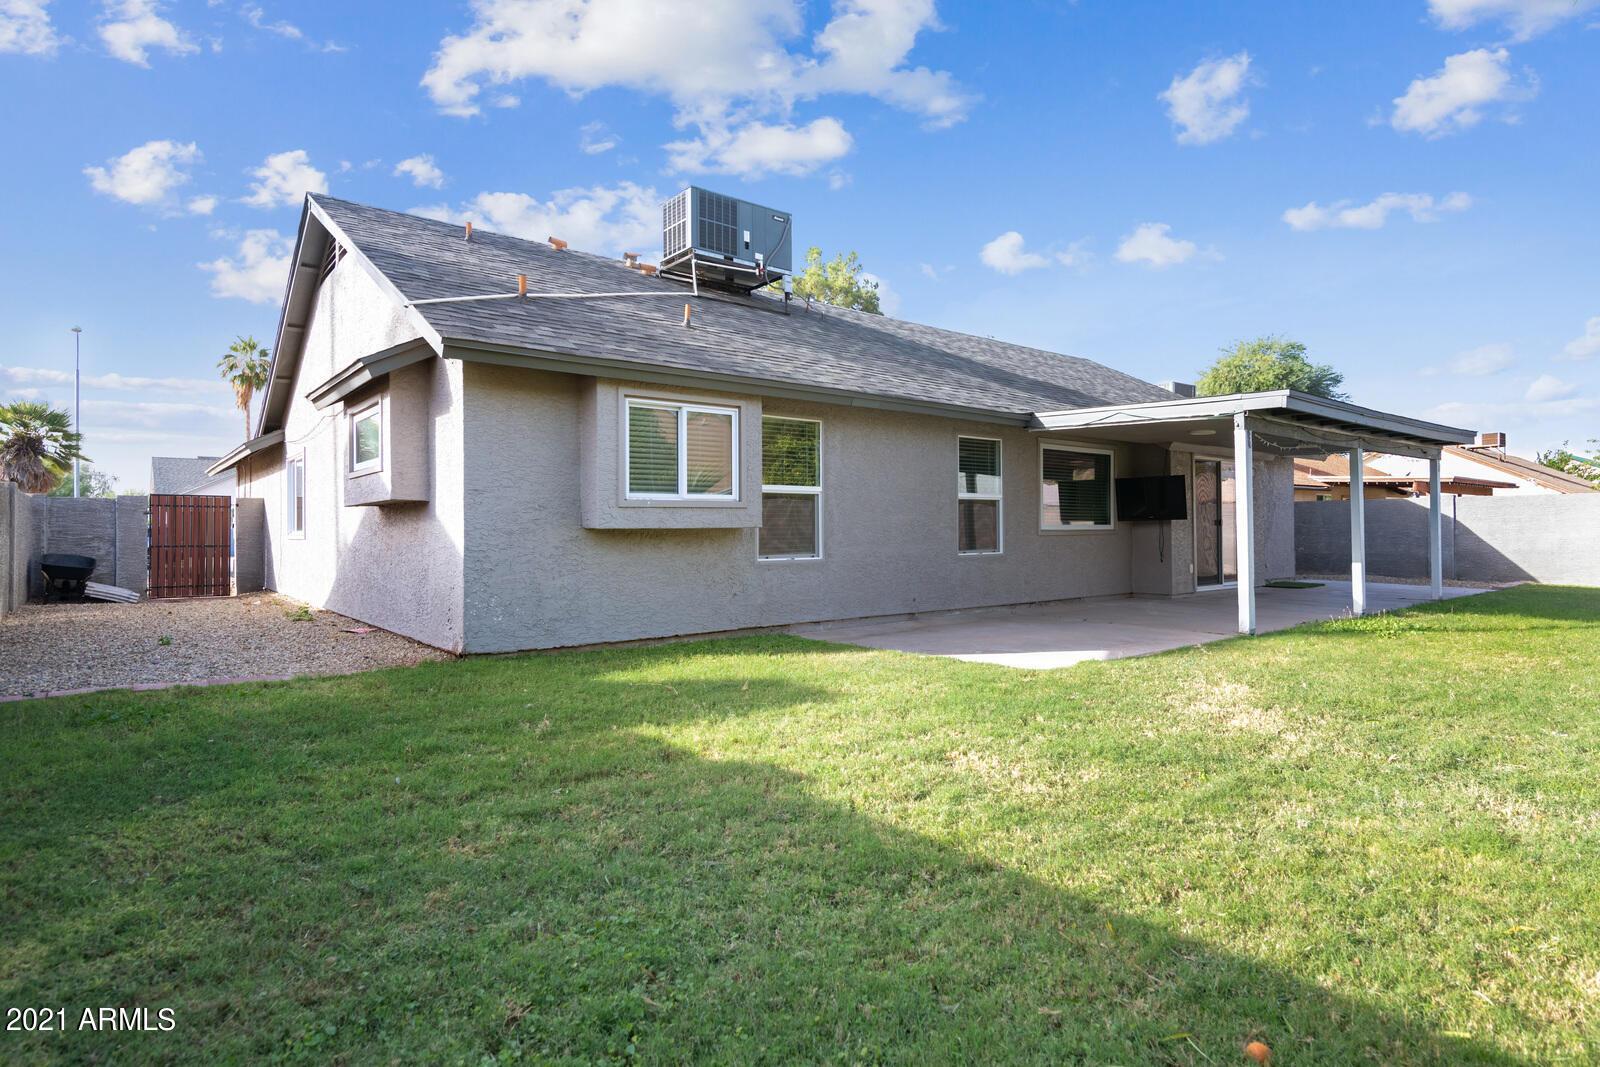 MLS 6306505 3612 W Elgin Street, Chandler, AZ 85226 Chandler AZ Hearthstone